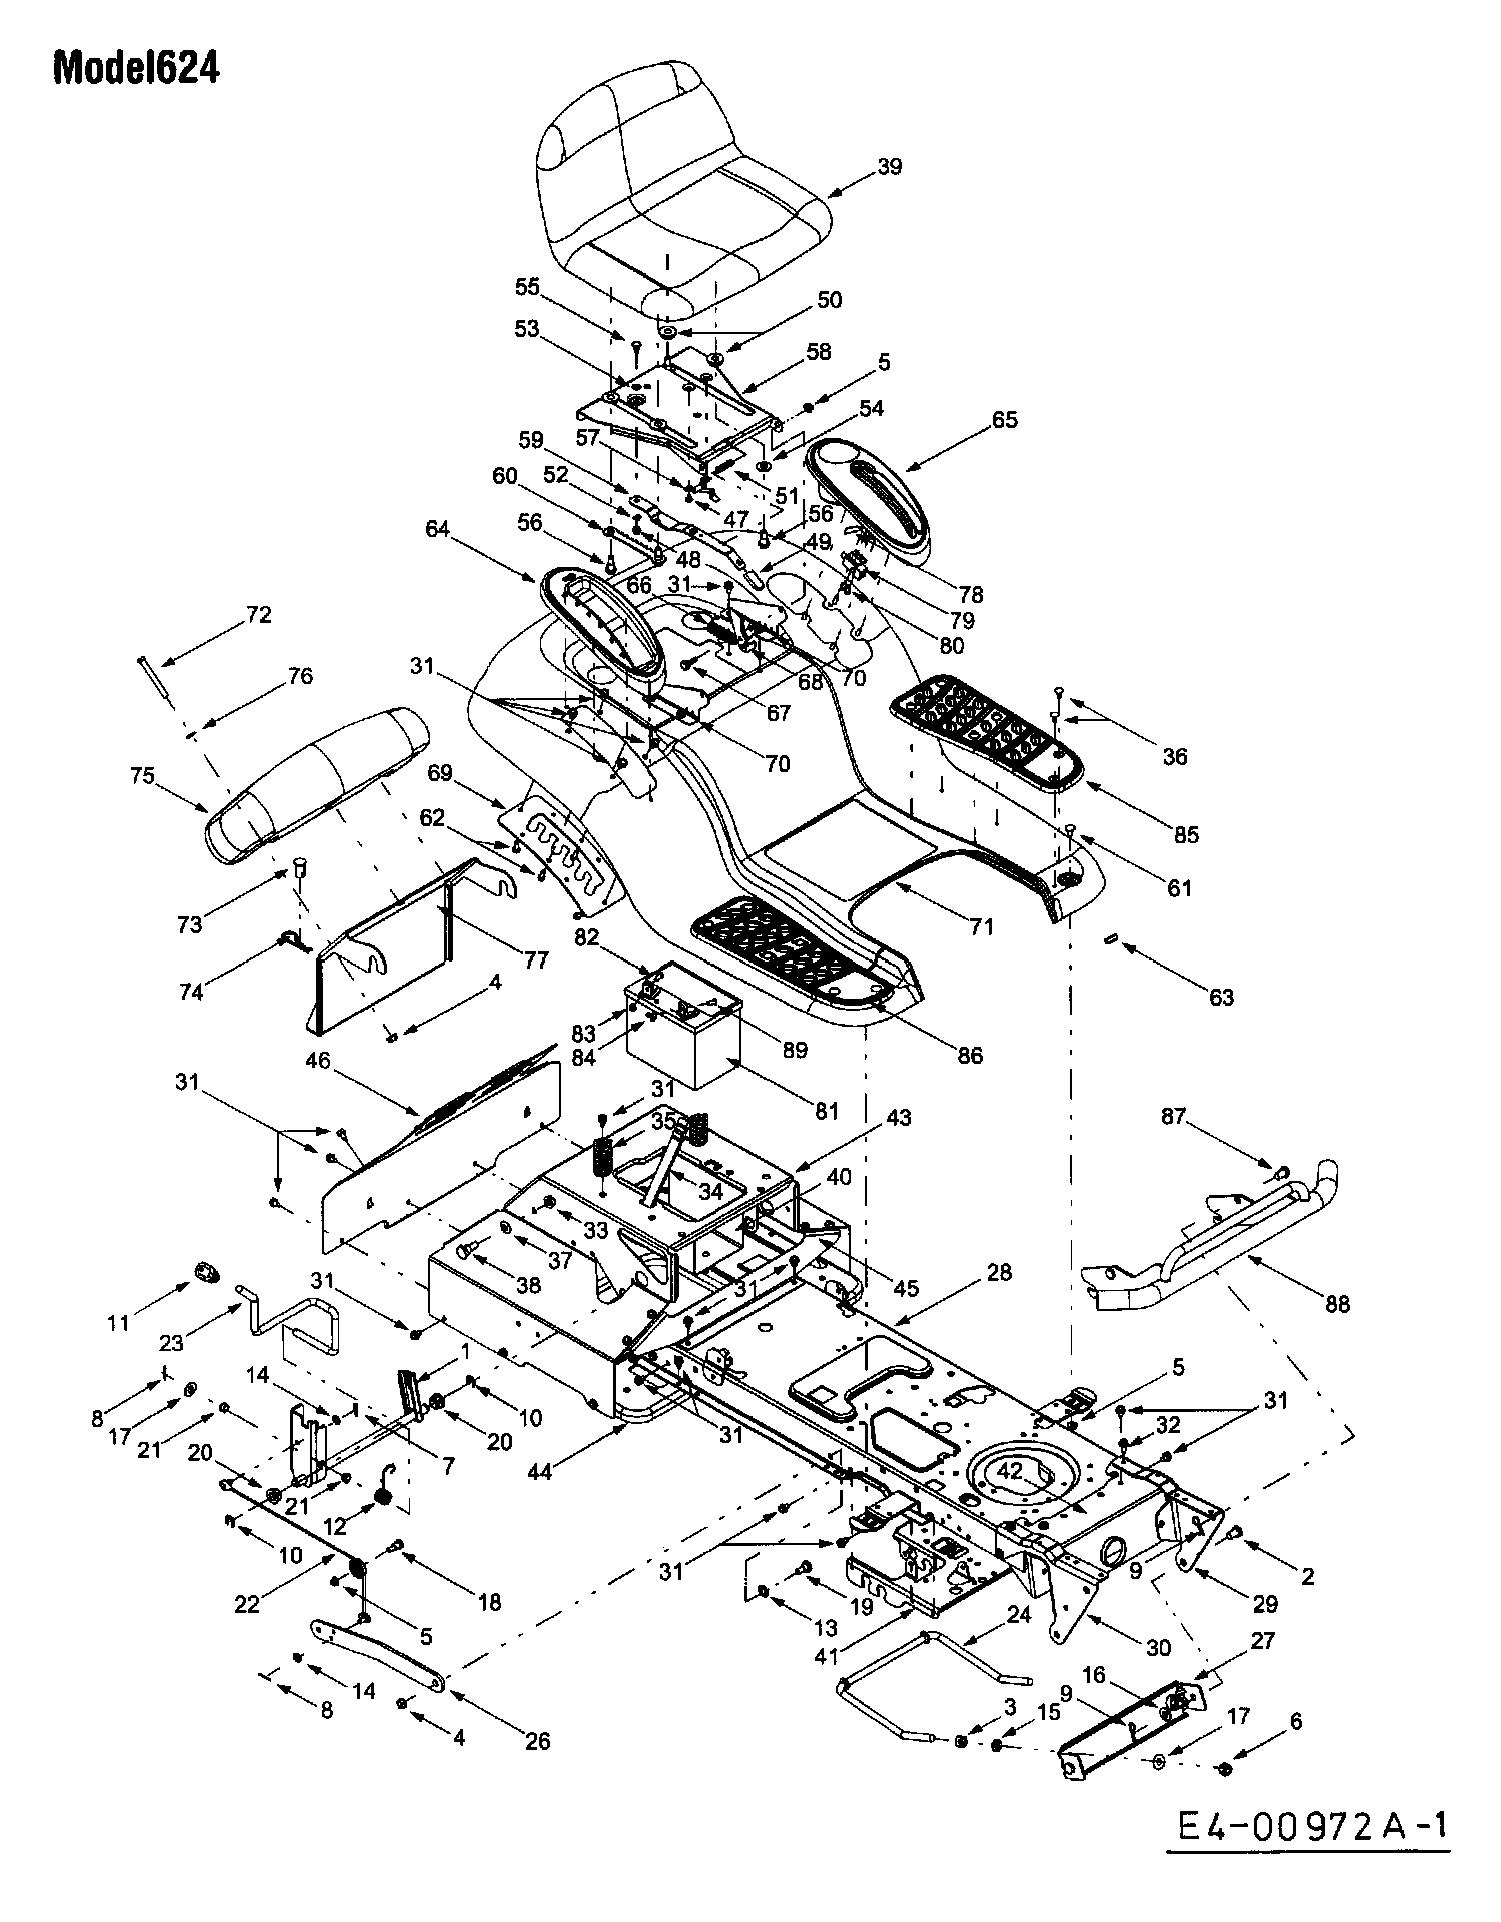 1983 Nissan 280zx Vacuum Diagram. Nissan. Auto Wiring Diagram